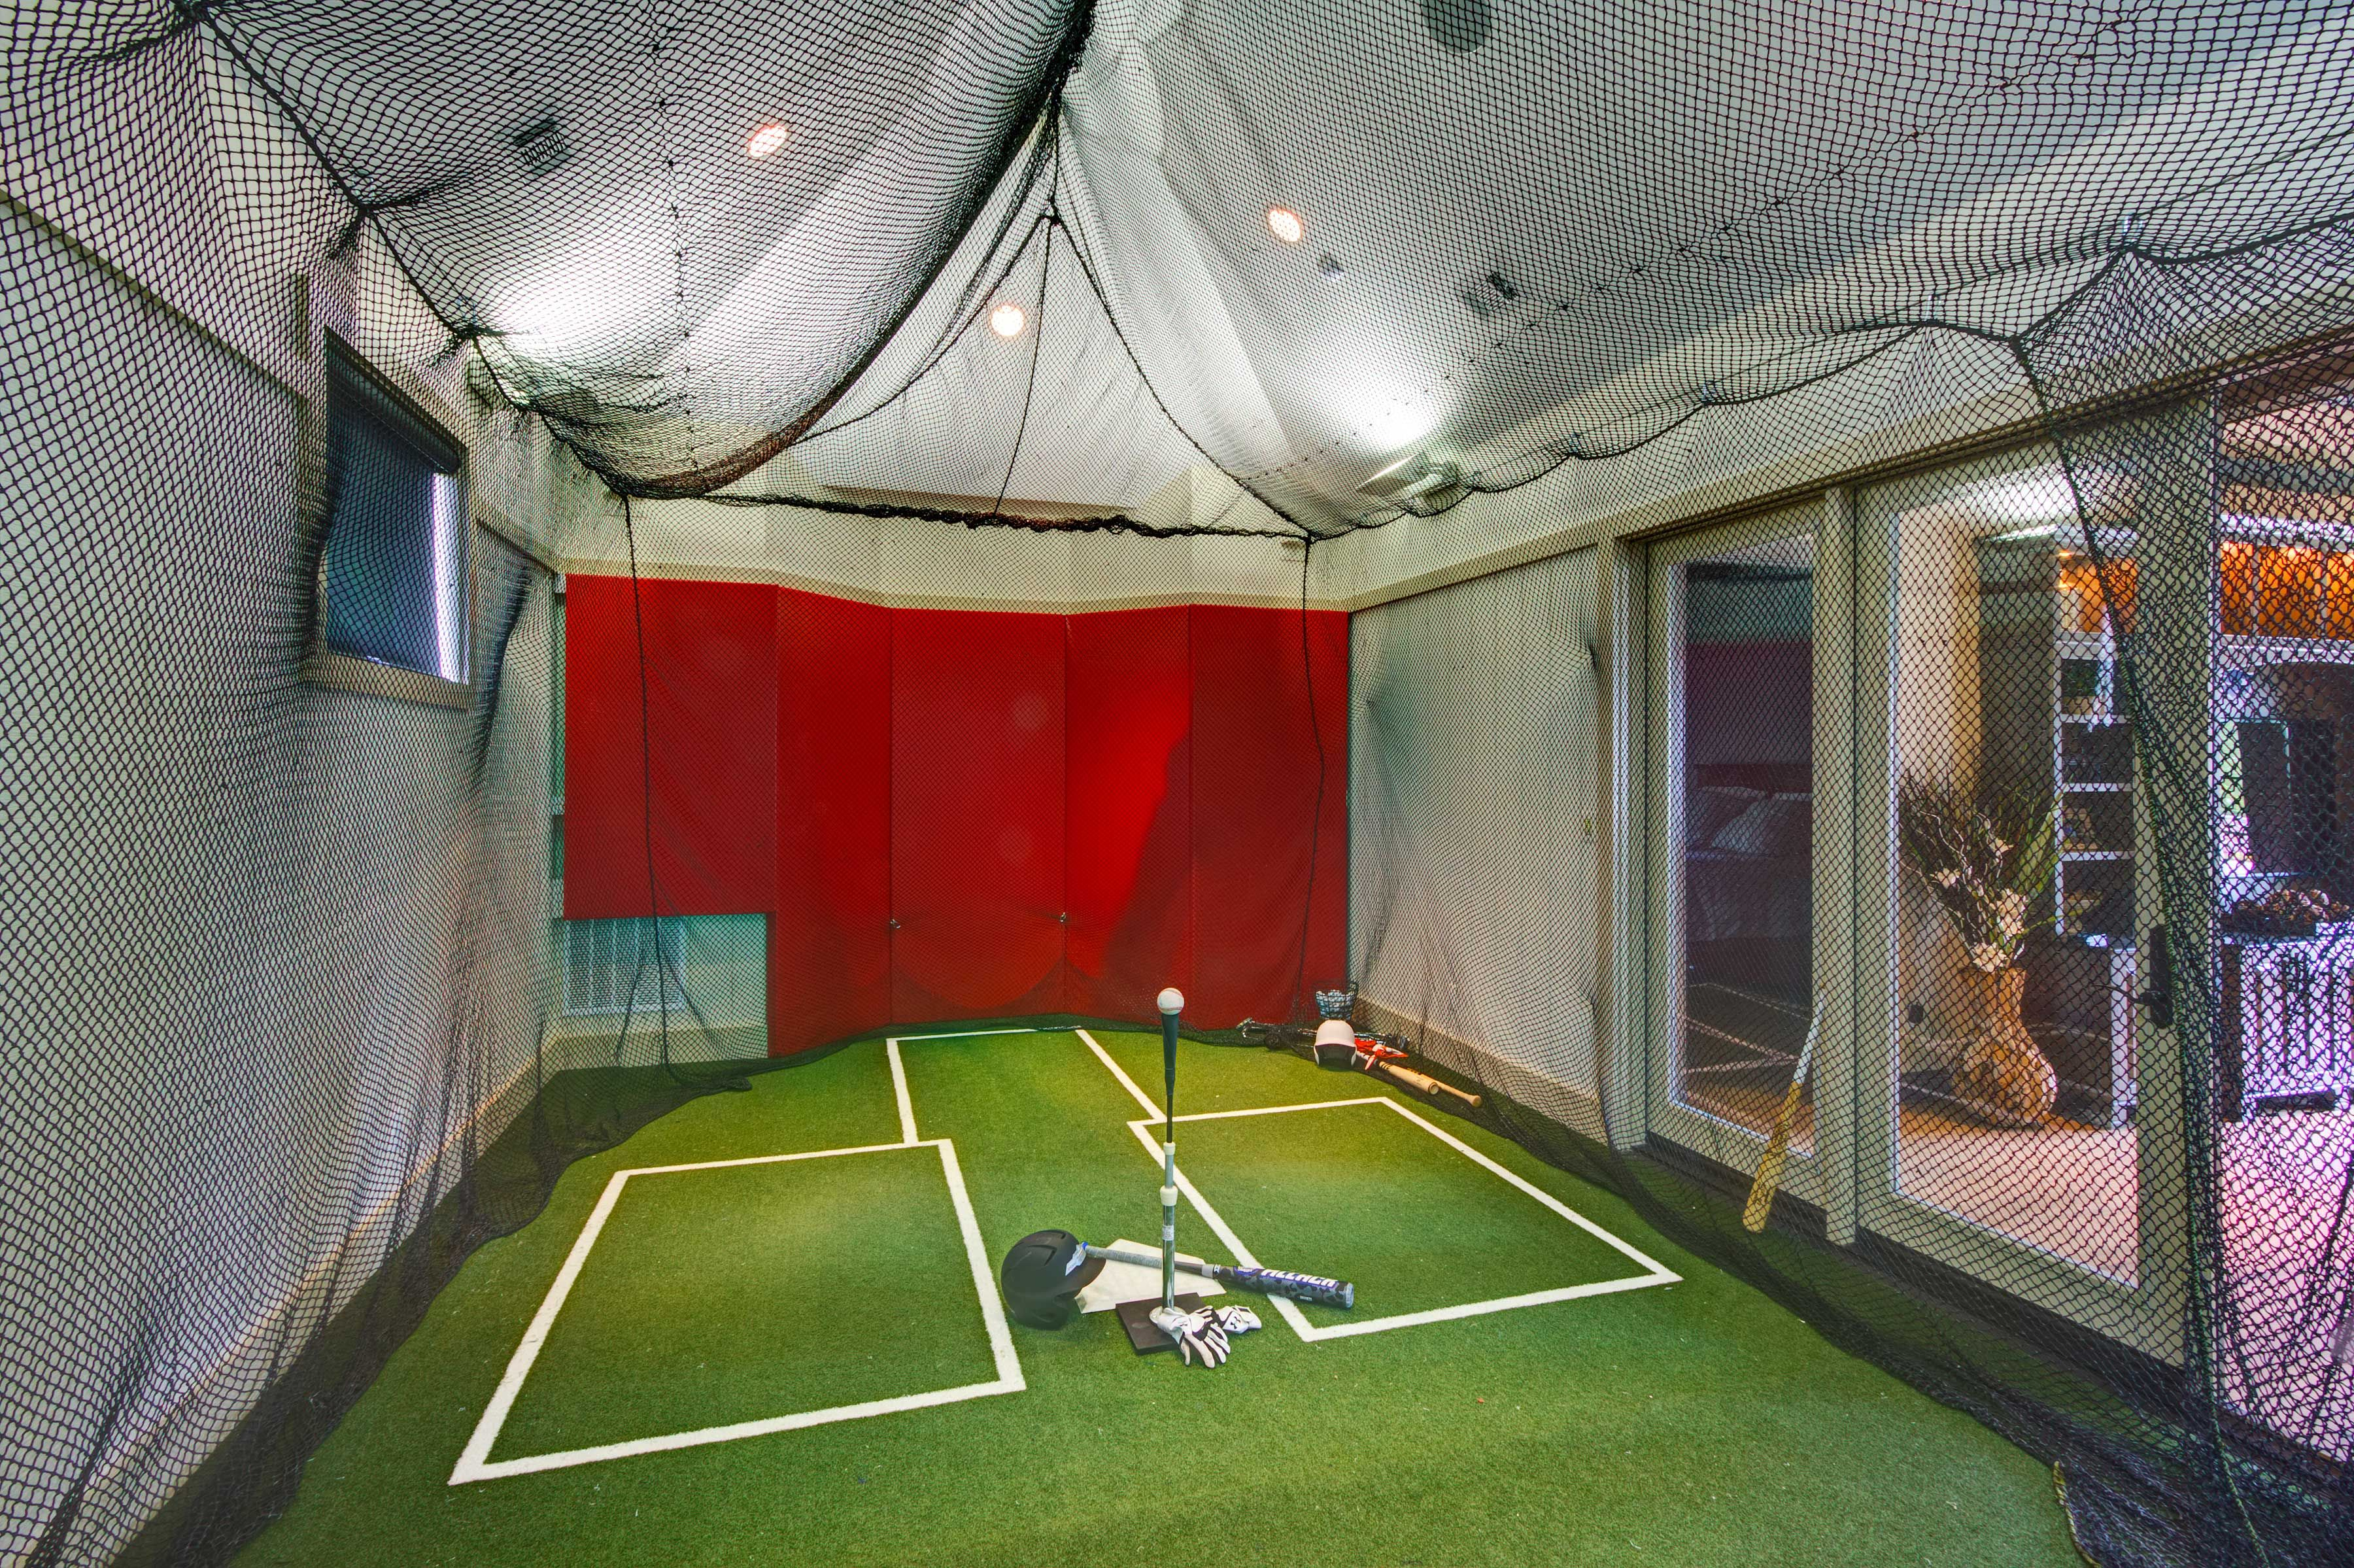 48+ Batting Cages For Backyard Background - HomeLooker